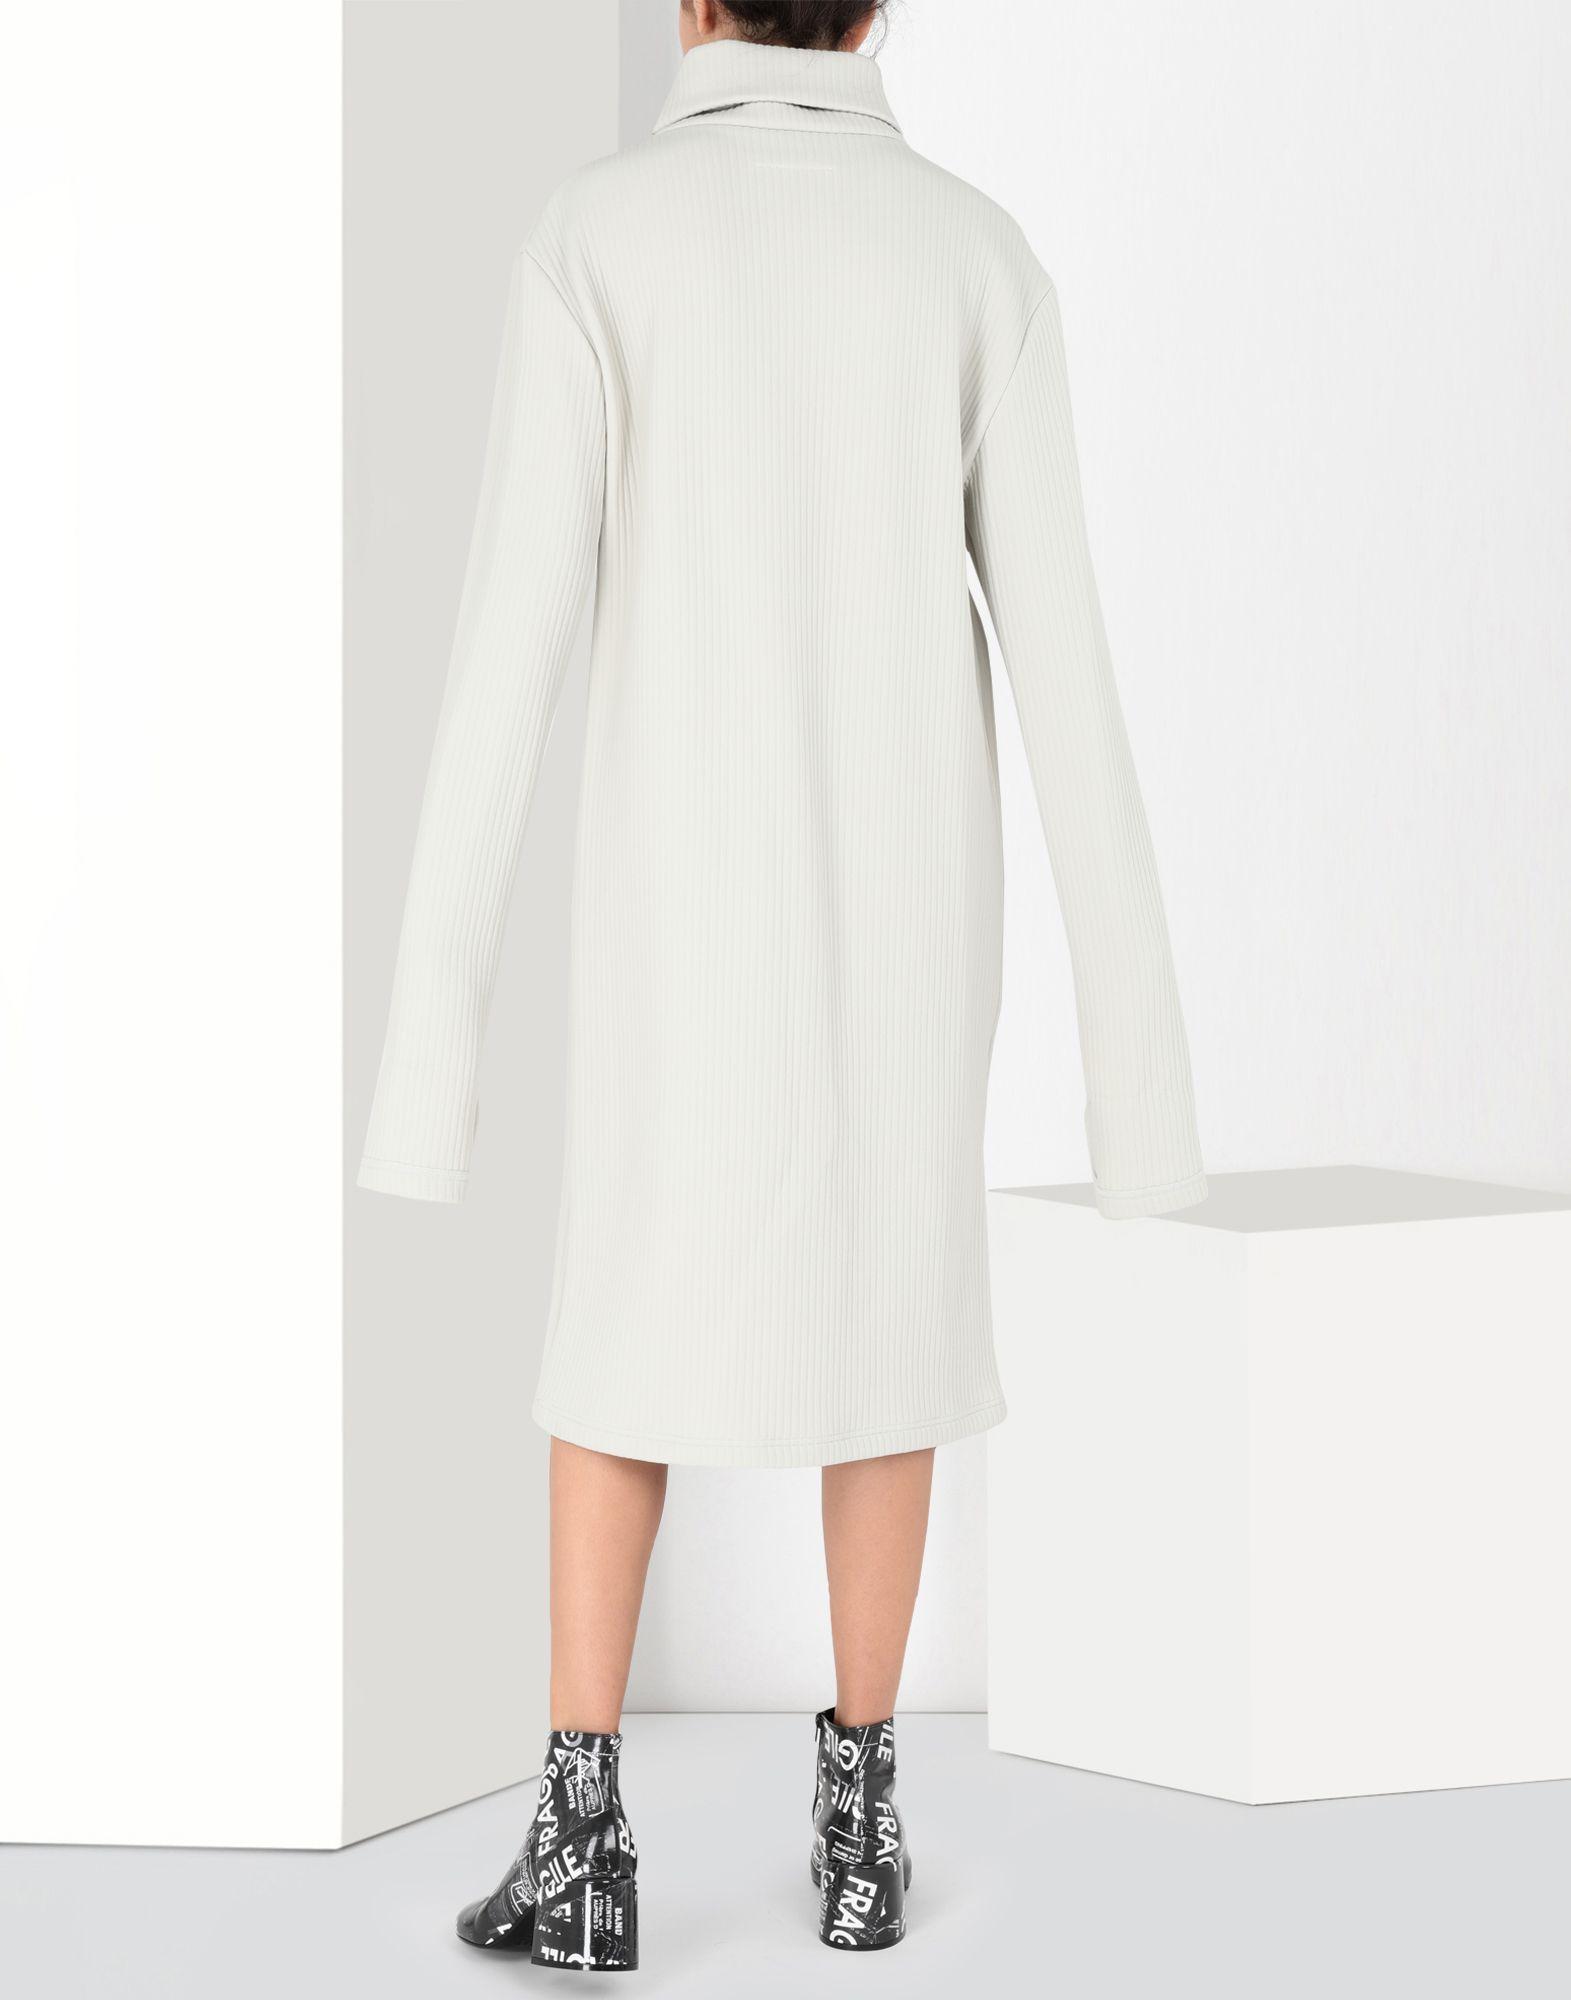 MM6 MAISON MARGIELA Ribbed jersey dress 3/4 length dress Woman d